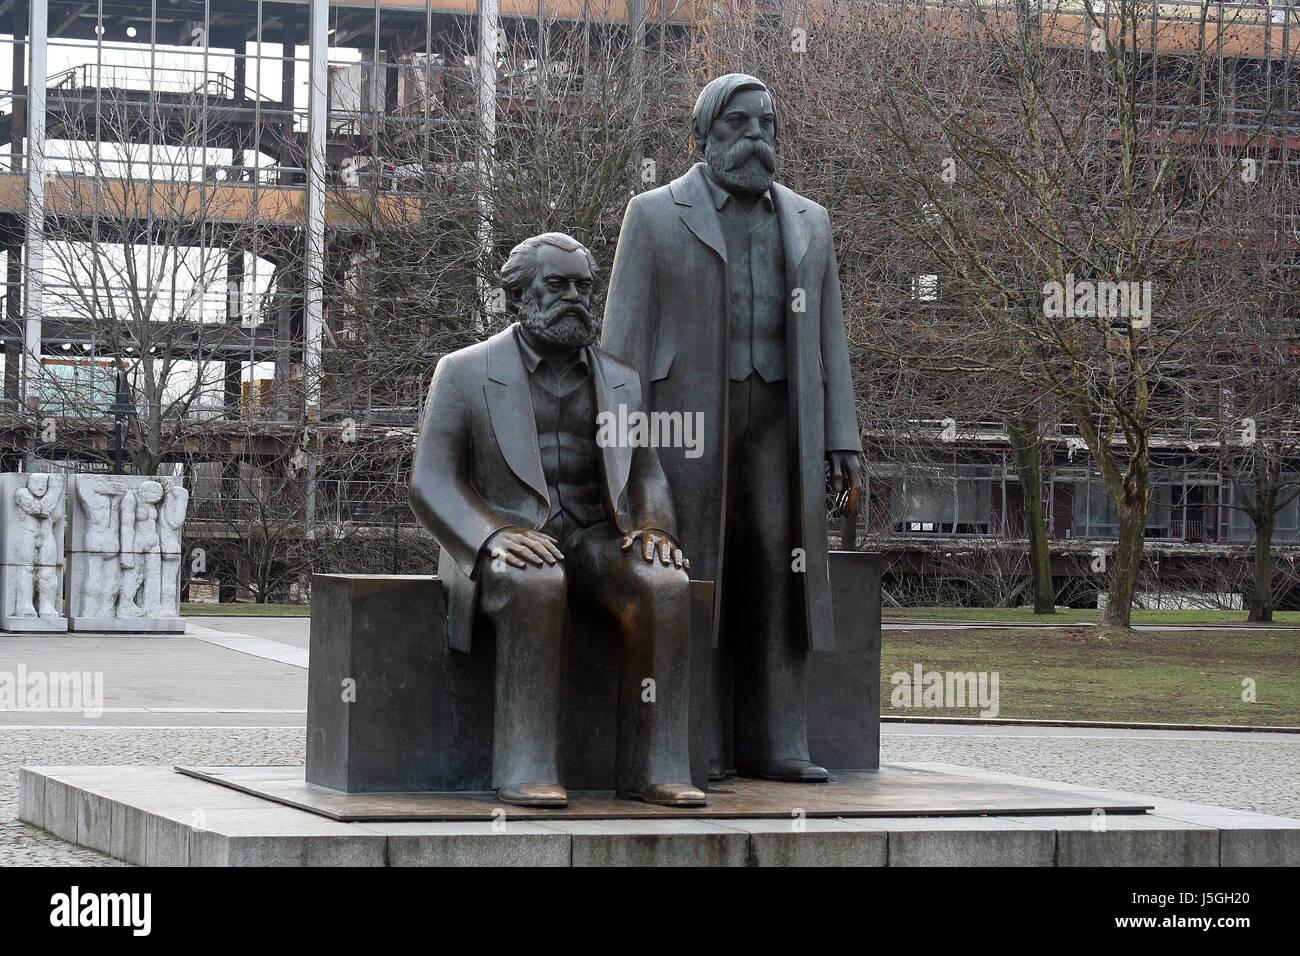 monument berlin capital socialists karl marx friedrich engels philosophen - Stock Image